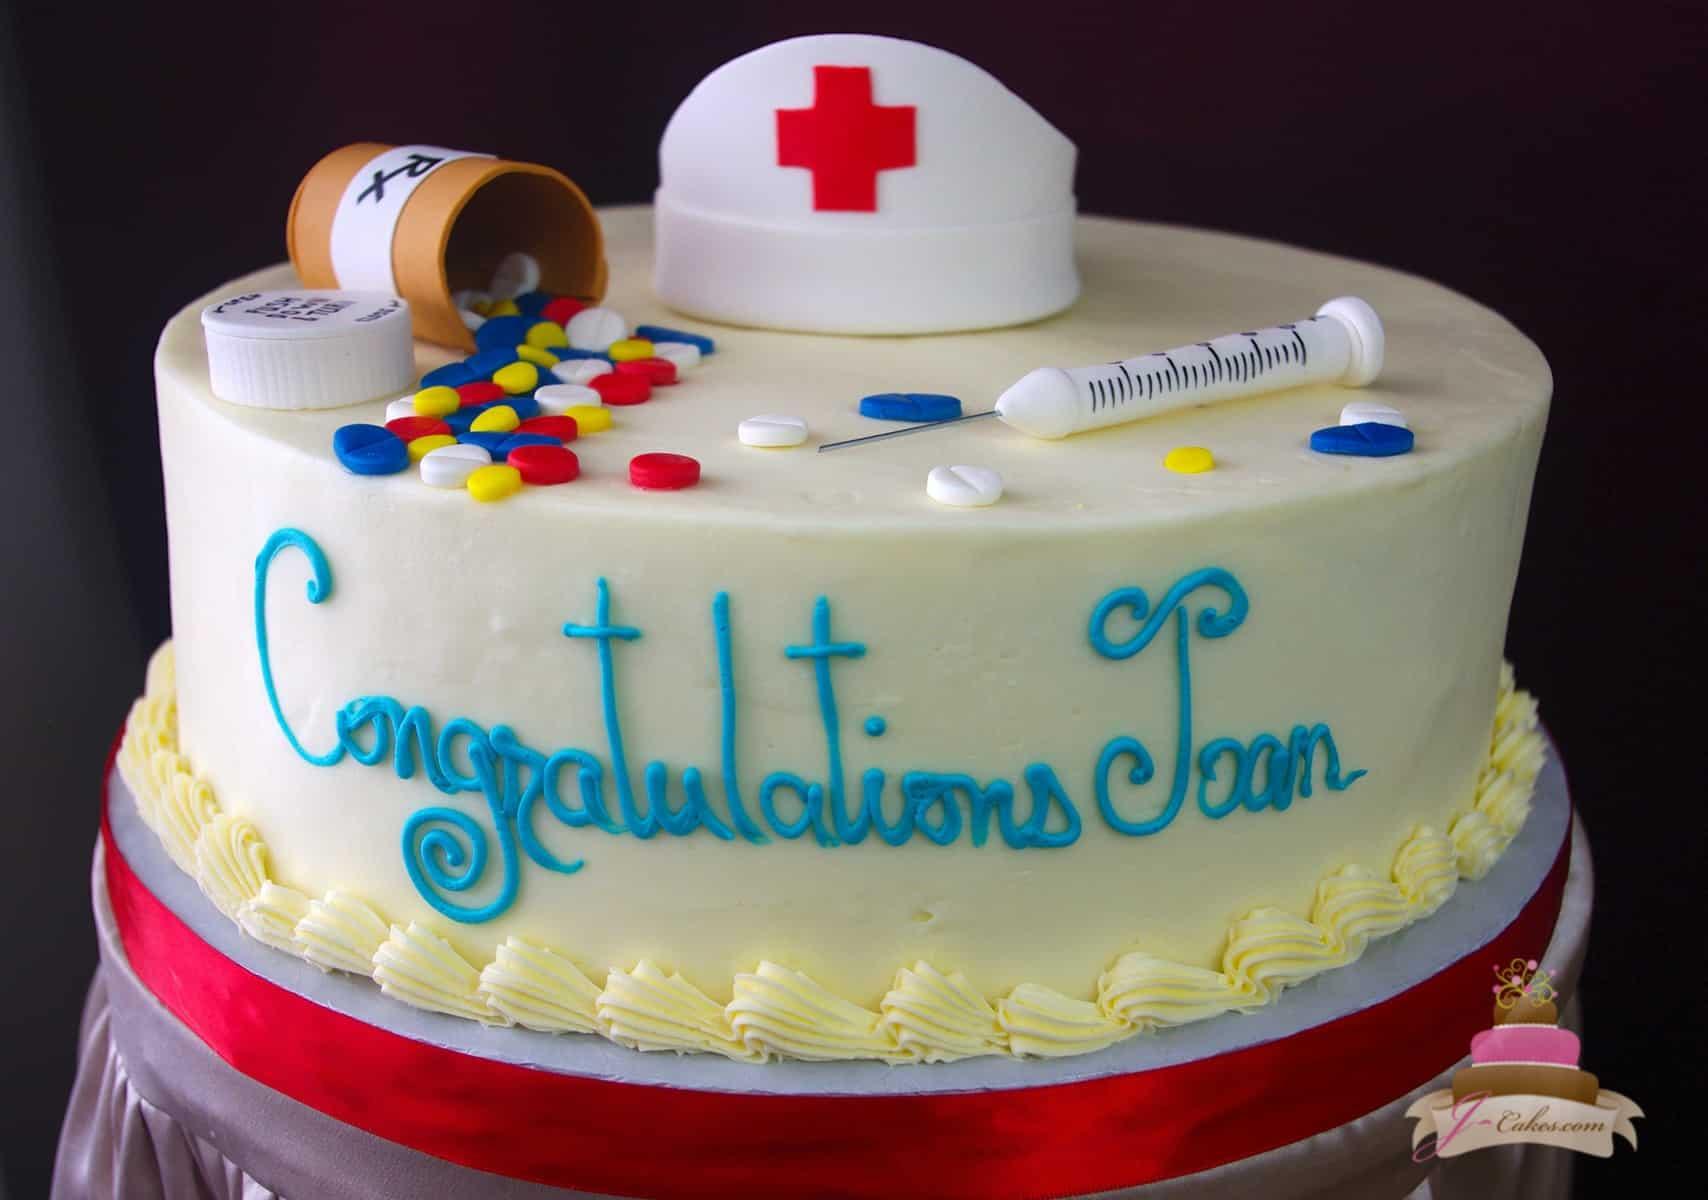 (837) - Nursing School Graduation